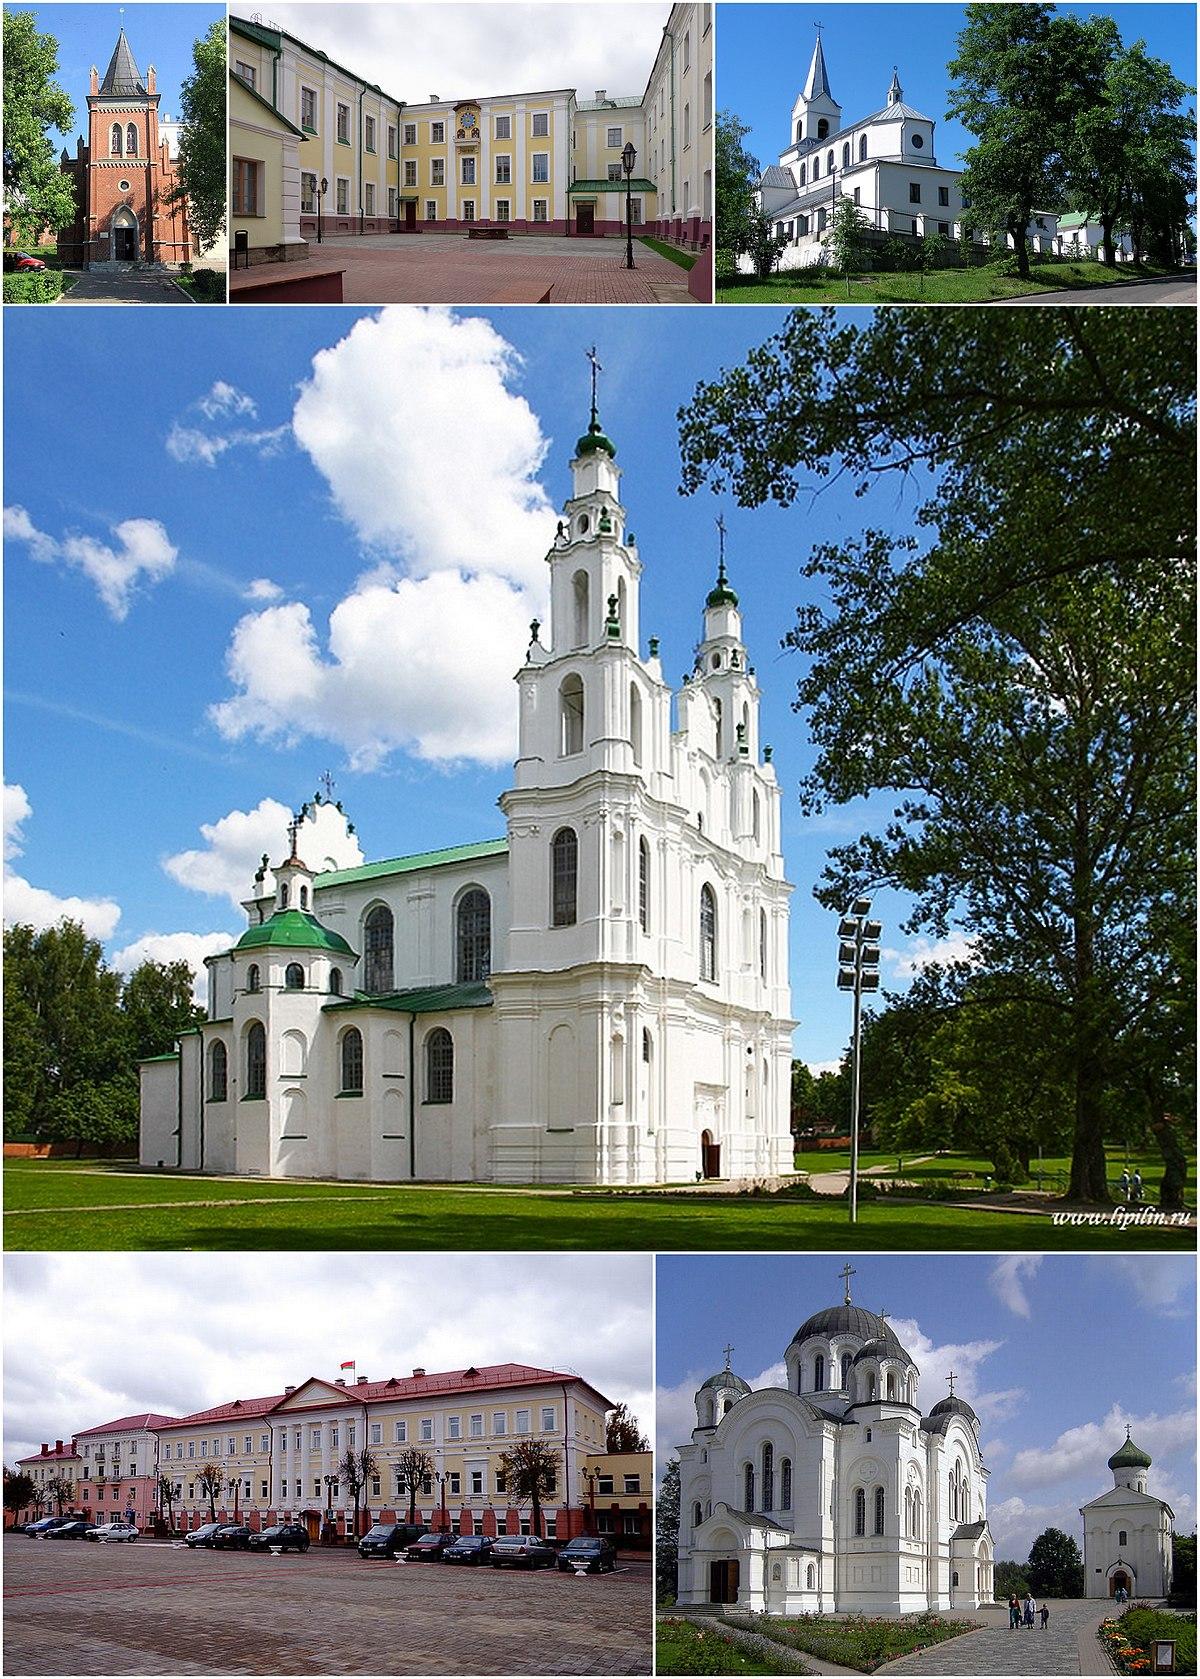 Polotsk State University in Vitebsk region 69